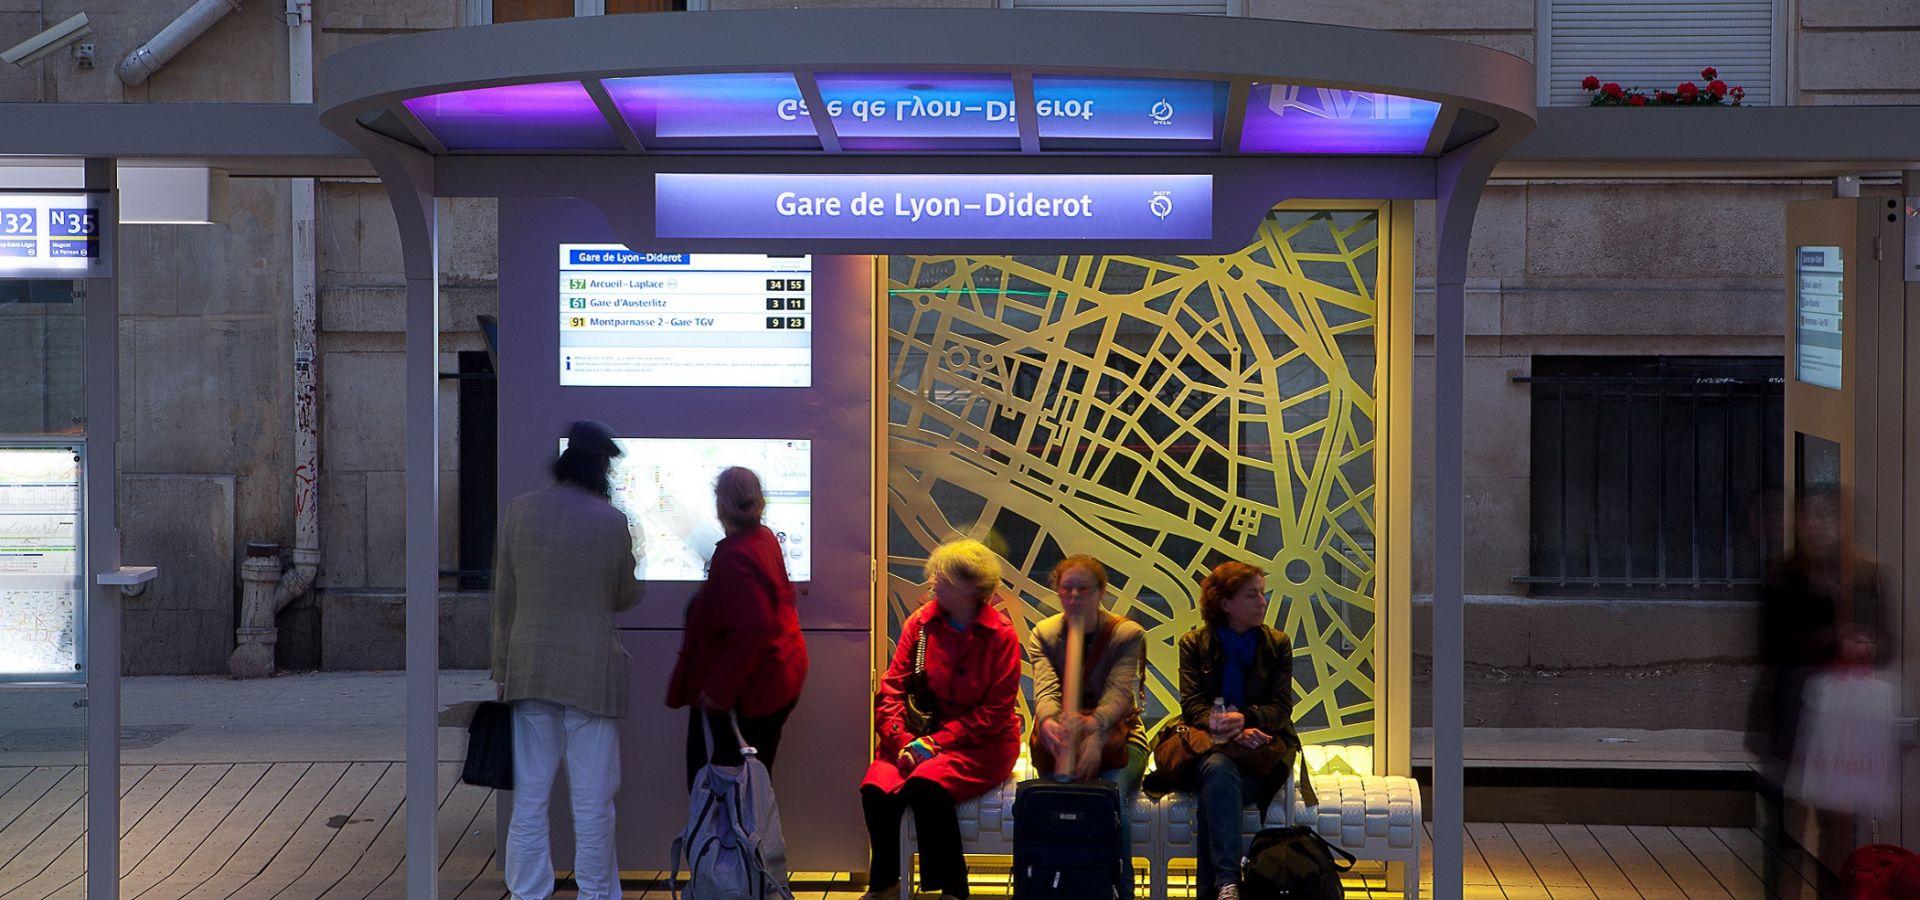 PARIS - Station de bus du futur - OSMOSE